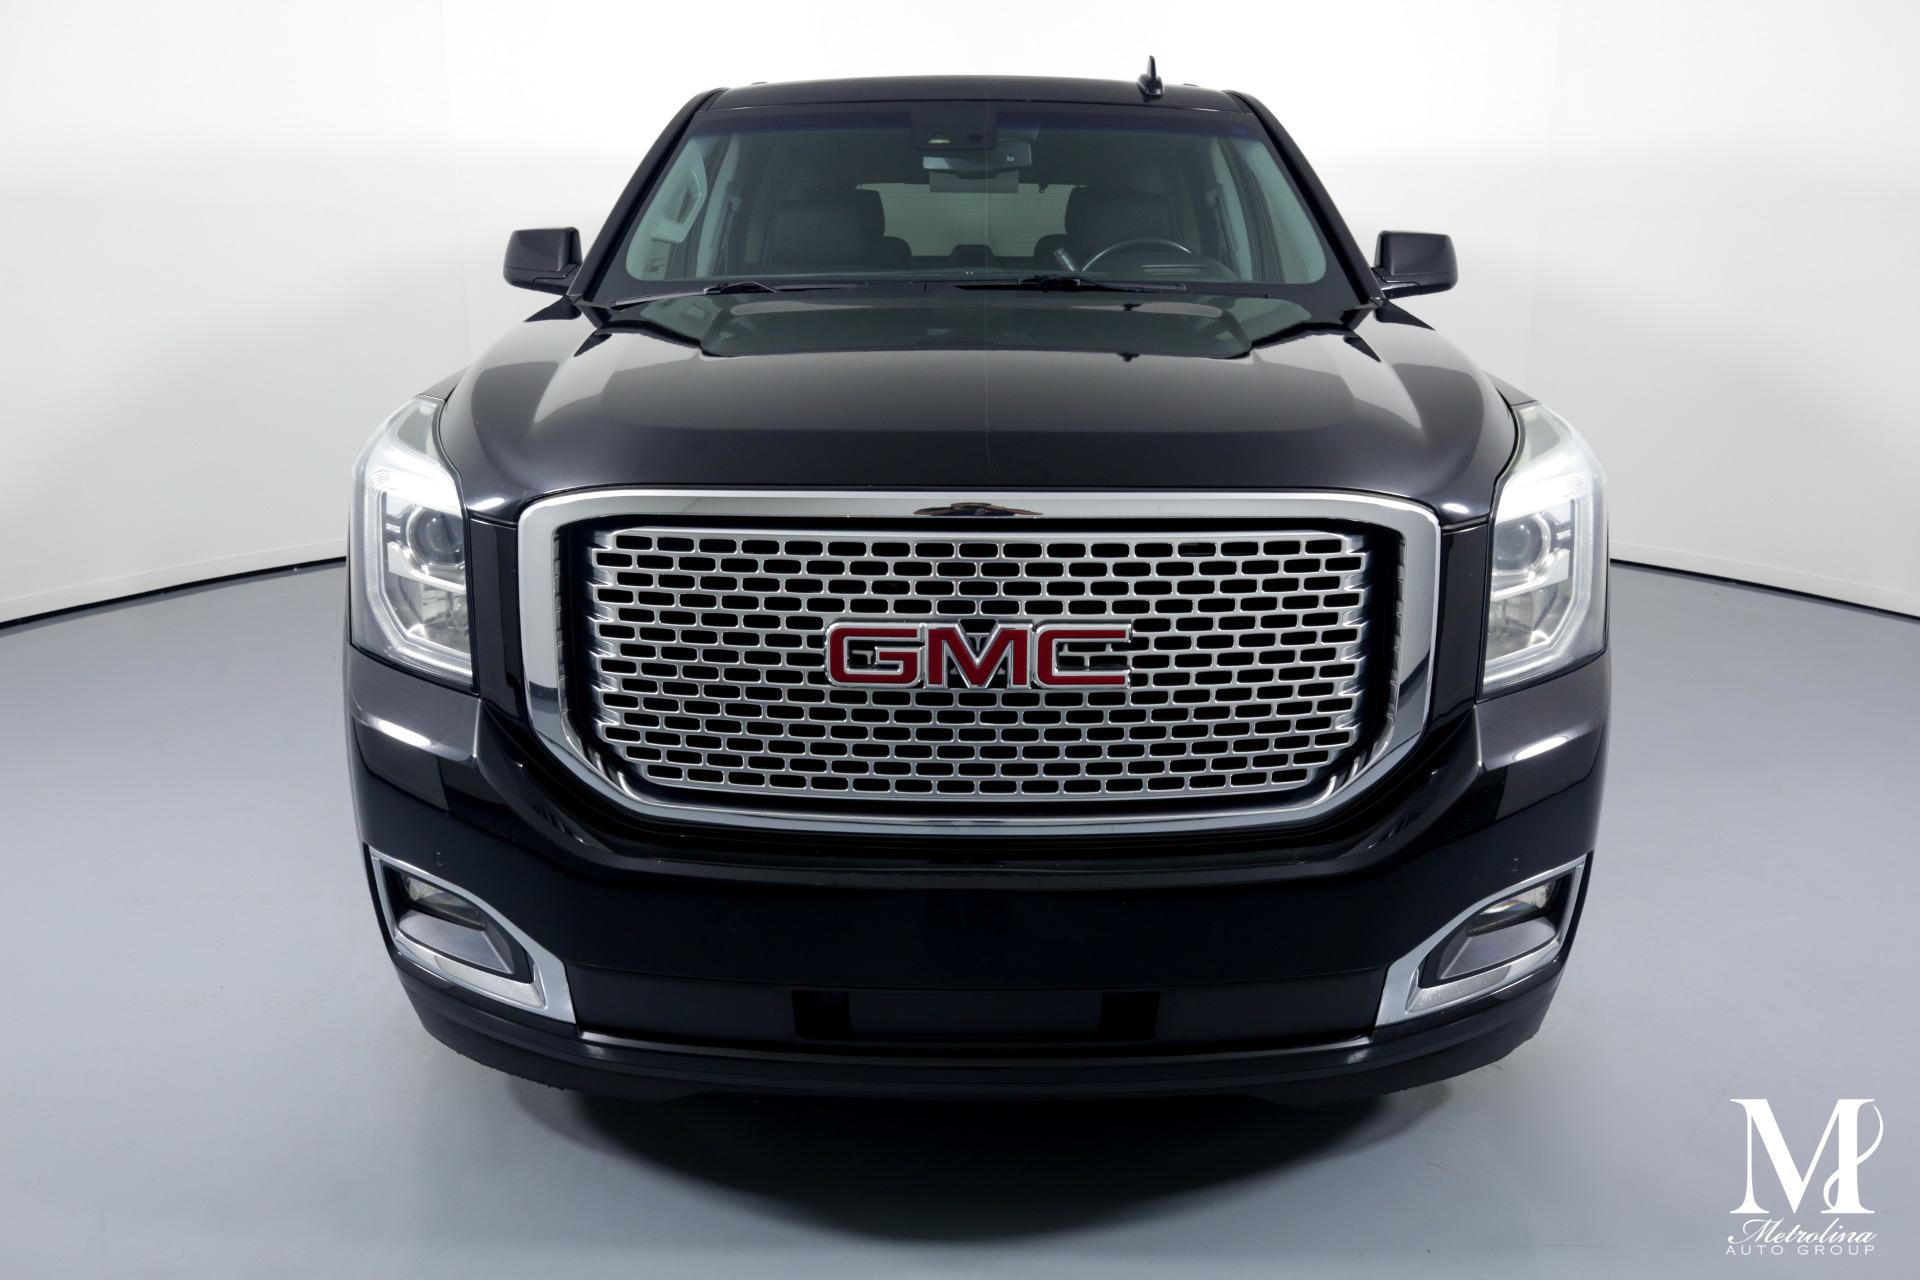 Used 2015 GMC Yukon Denali for sale $44,996 at Metrolina Auto Group in Charlotte NC 28217 - 3